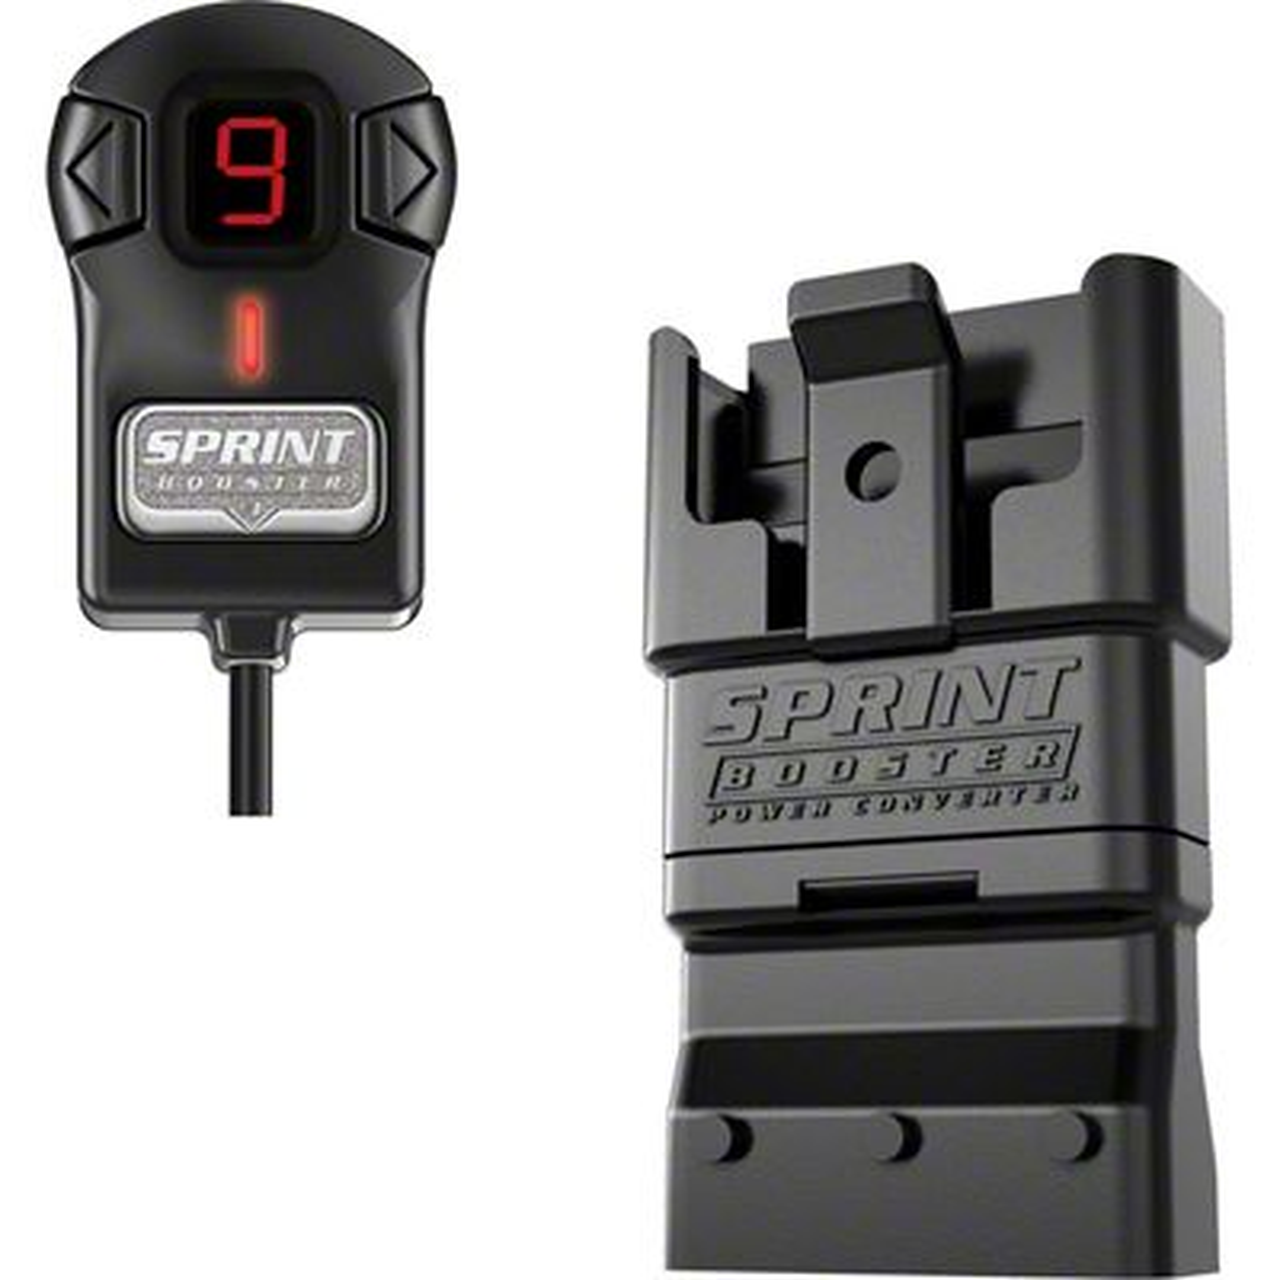 Sprint Booster V3 Power Converter (07-18 Jeep Wrangler JK)